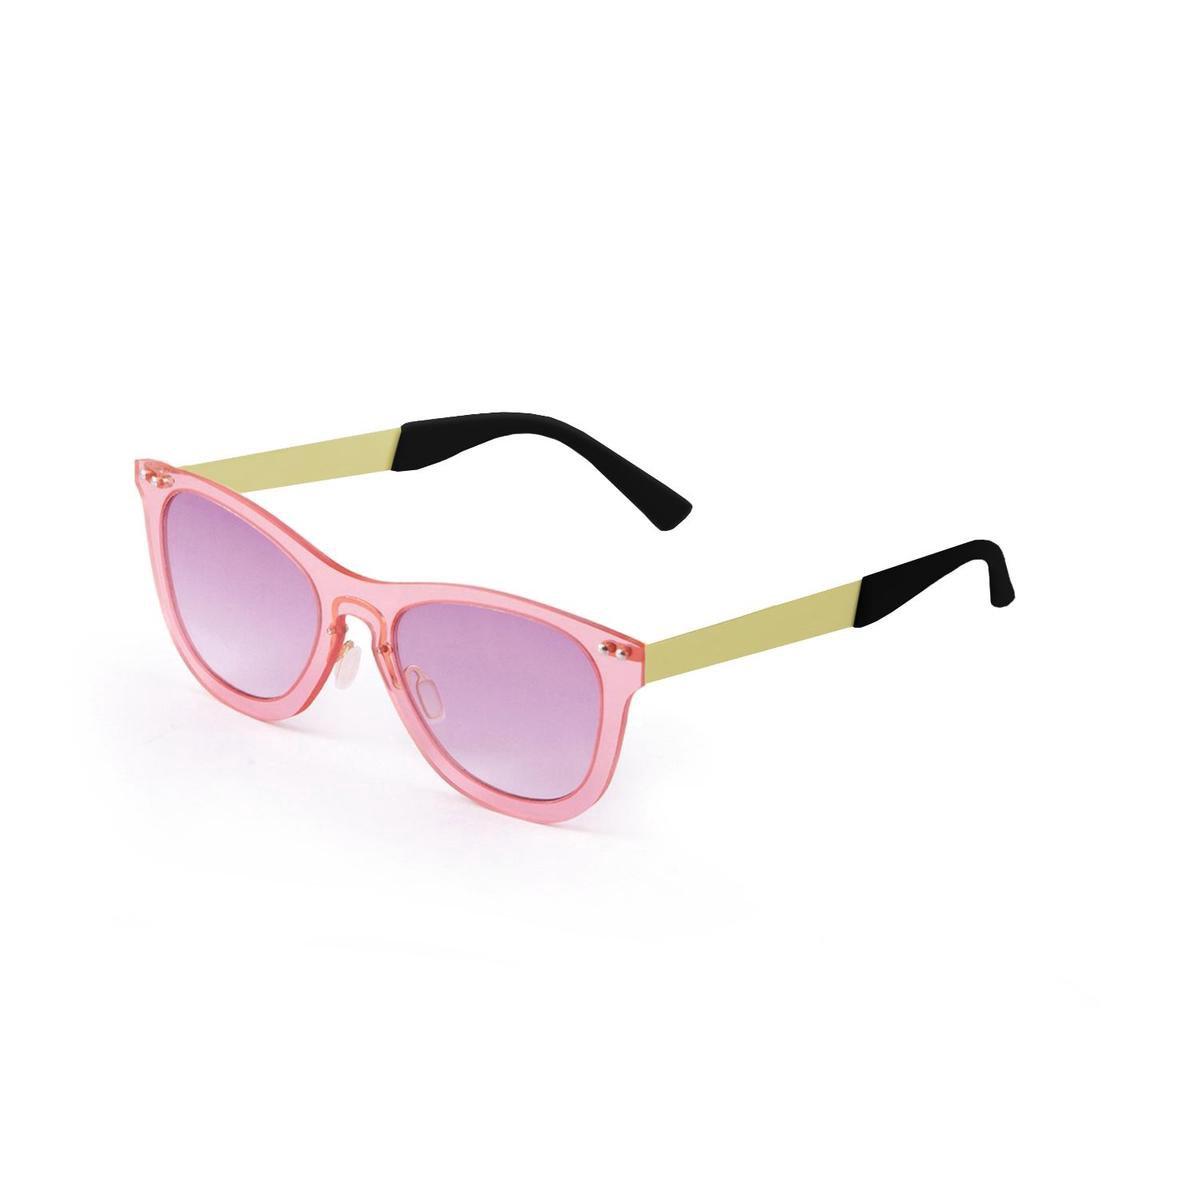 Ocean Sunglasses - Zonnebril - Unisex - 24.12_FLORENCIA_VIOLET-PINK - Ocean Sunglasses